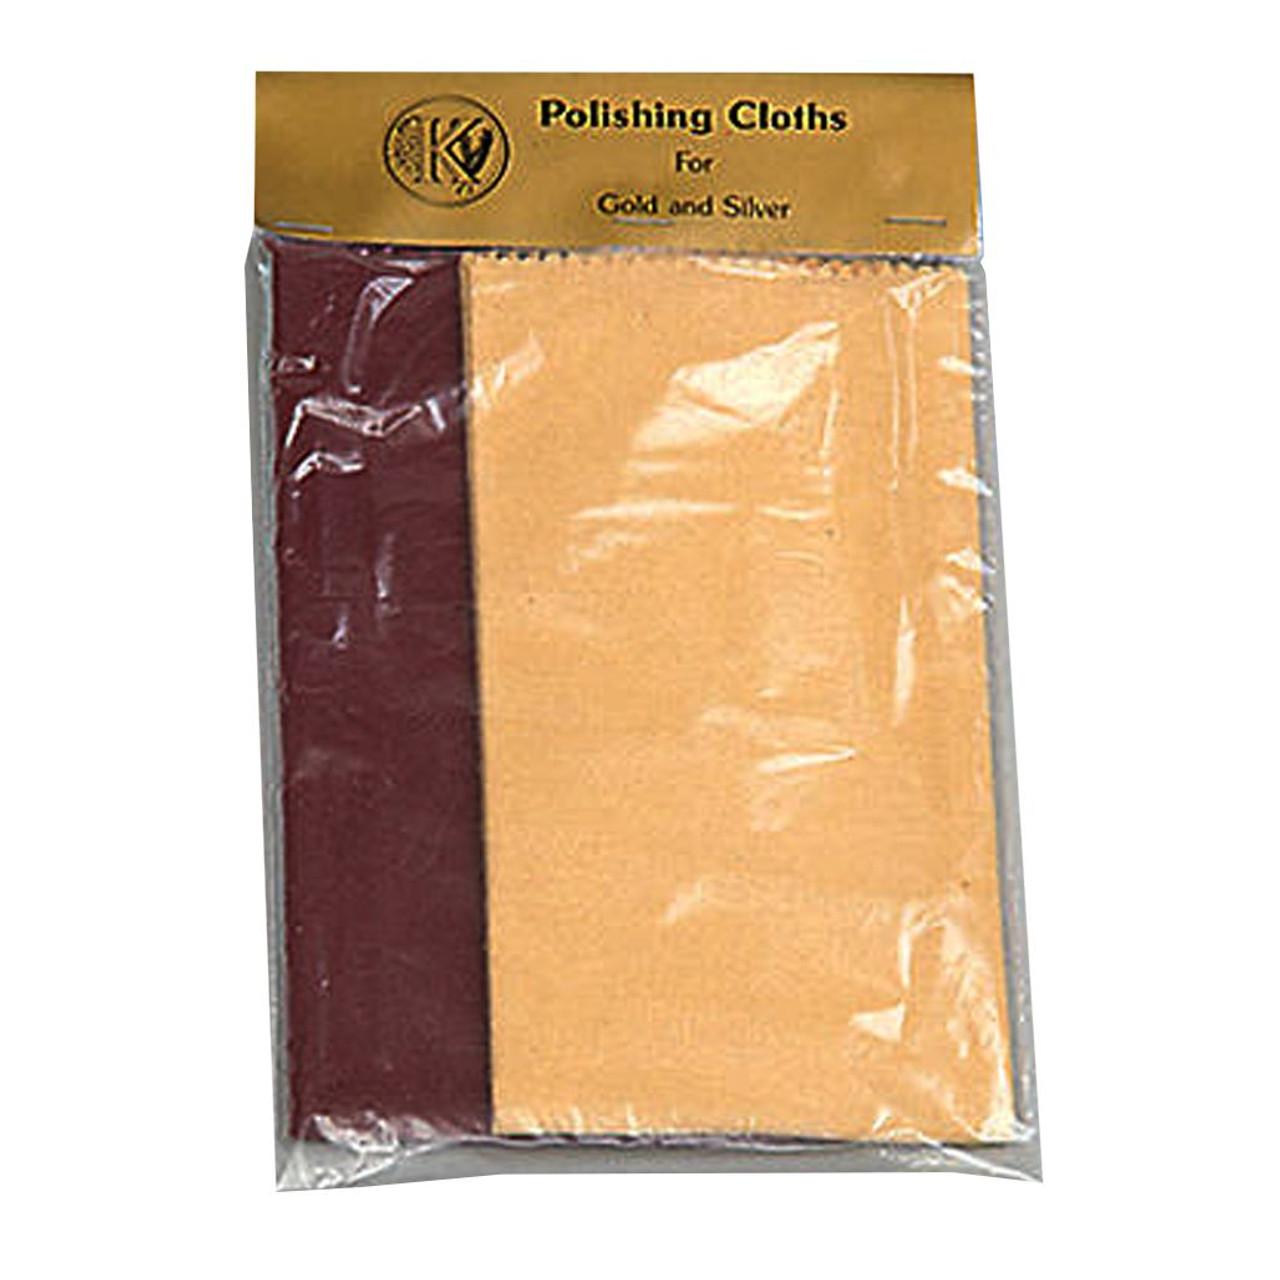 Gold & Silver Polishing Cloth - 2 Per Bag